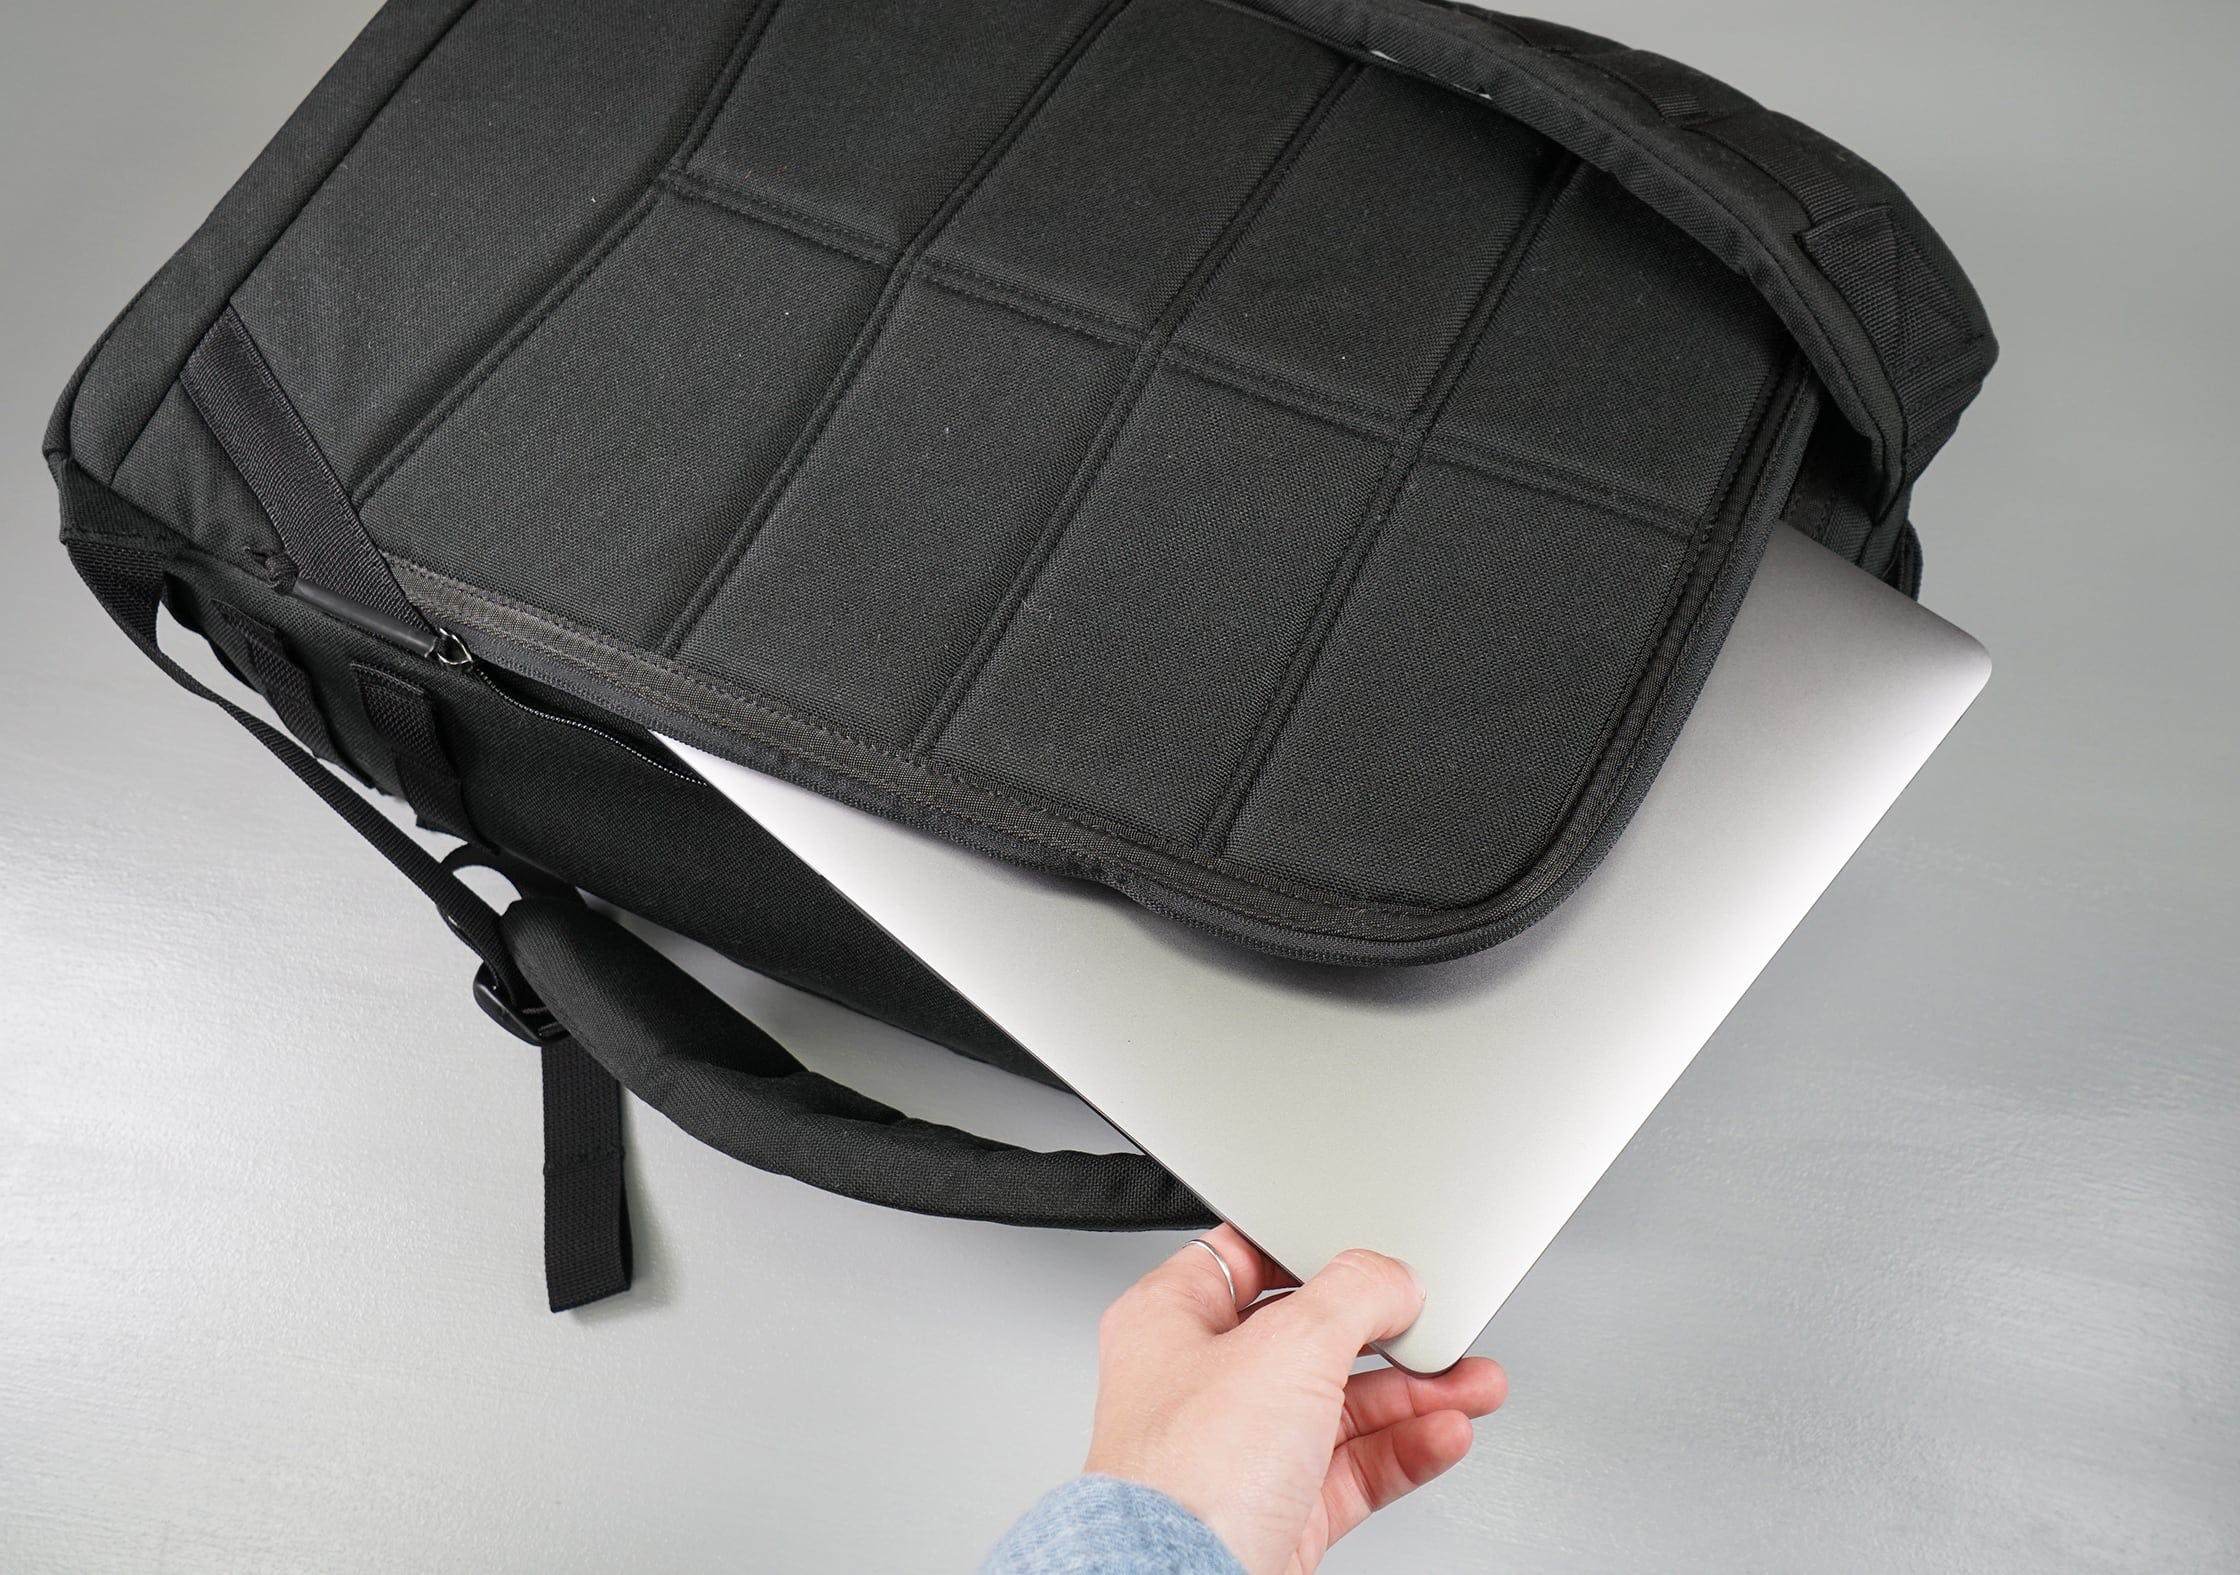 GORUCK GR1 Laptop Compartment